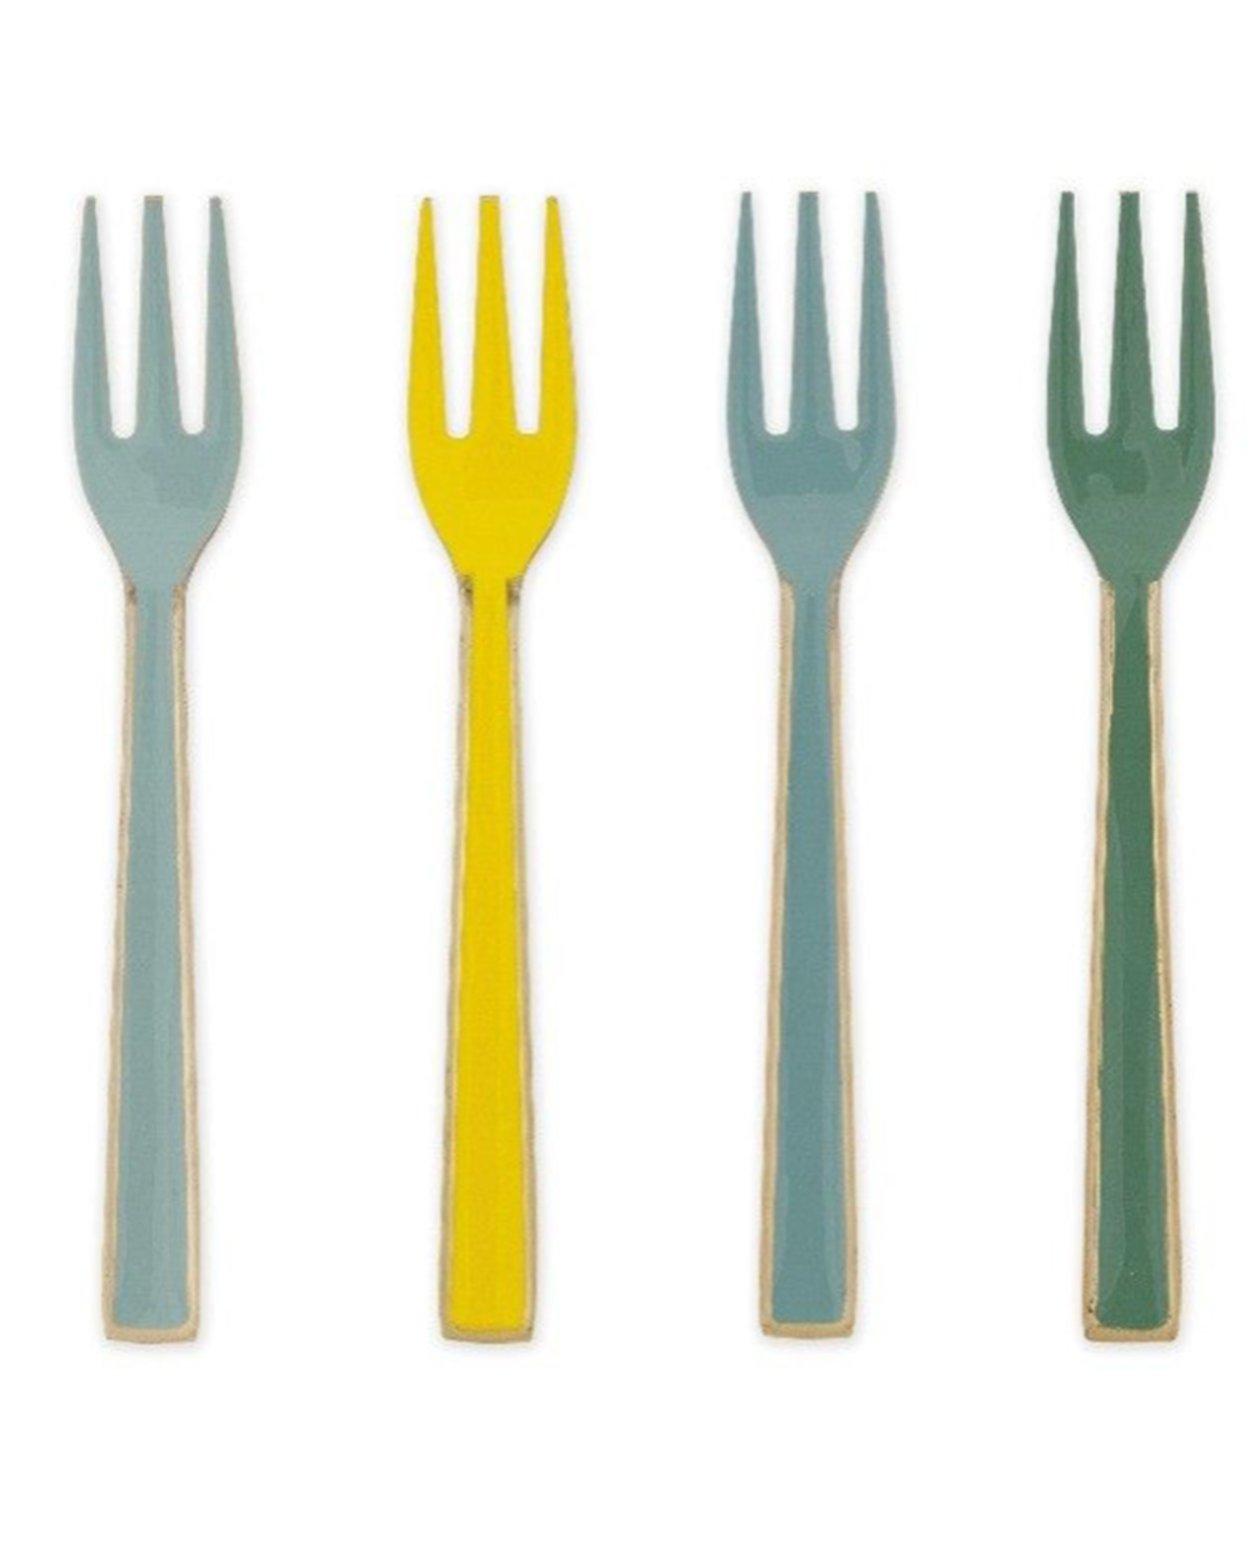 Blushing Birds Enamel Cake Forks - Four Piece Set